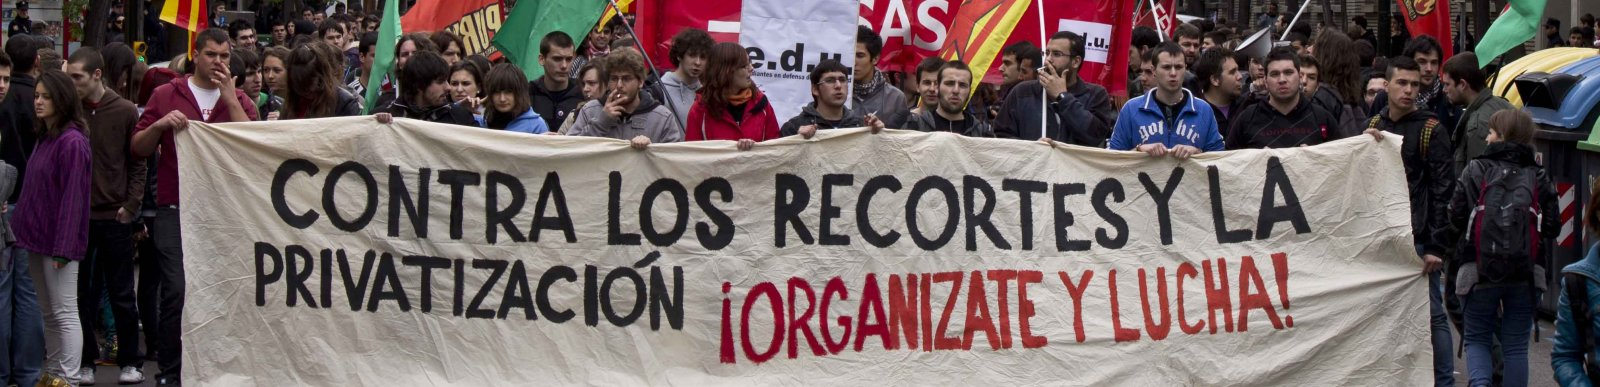 Student demonstration against cuts in public education, April 2012, Zaragoza, Spain